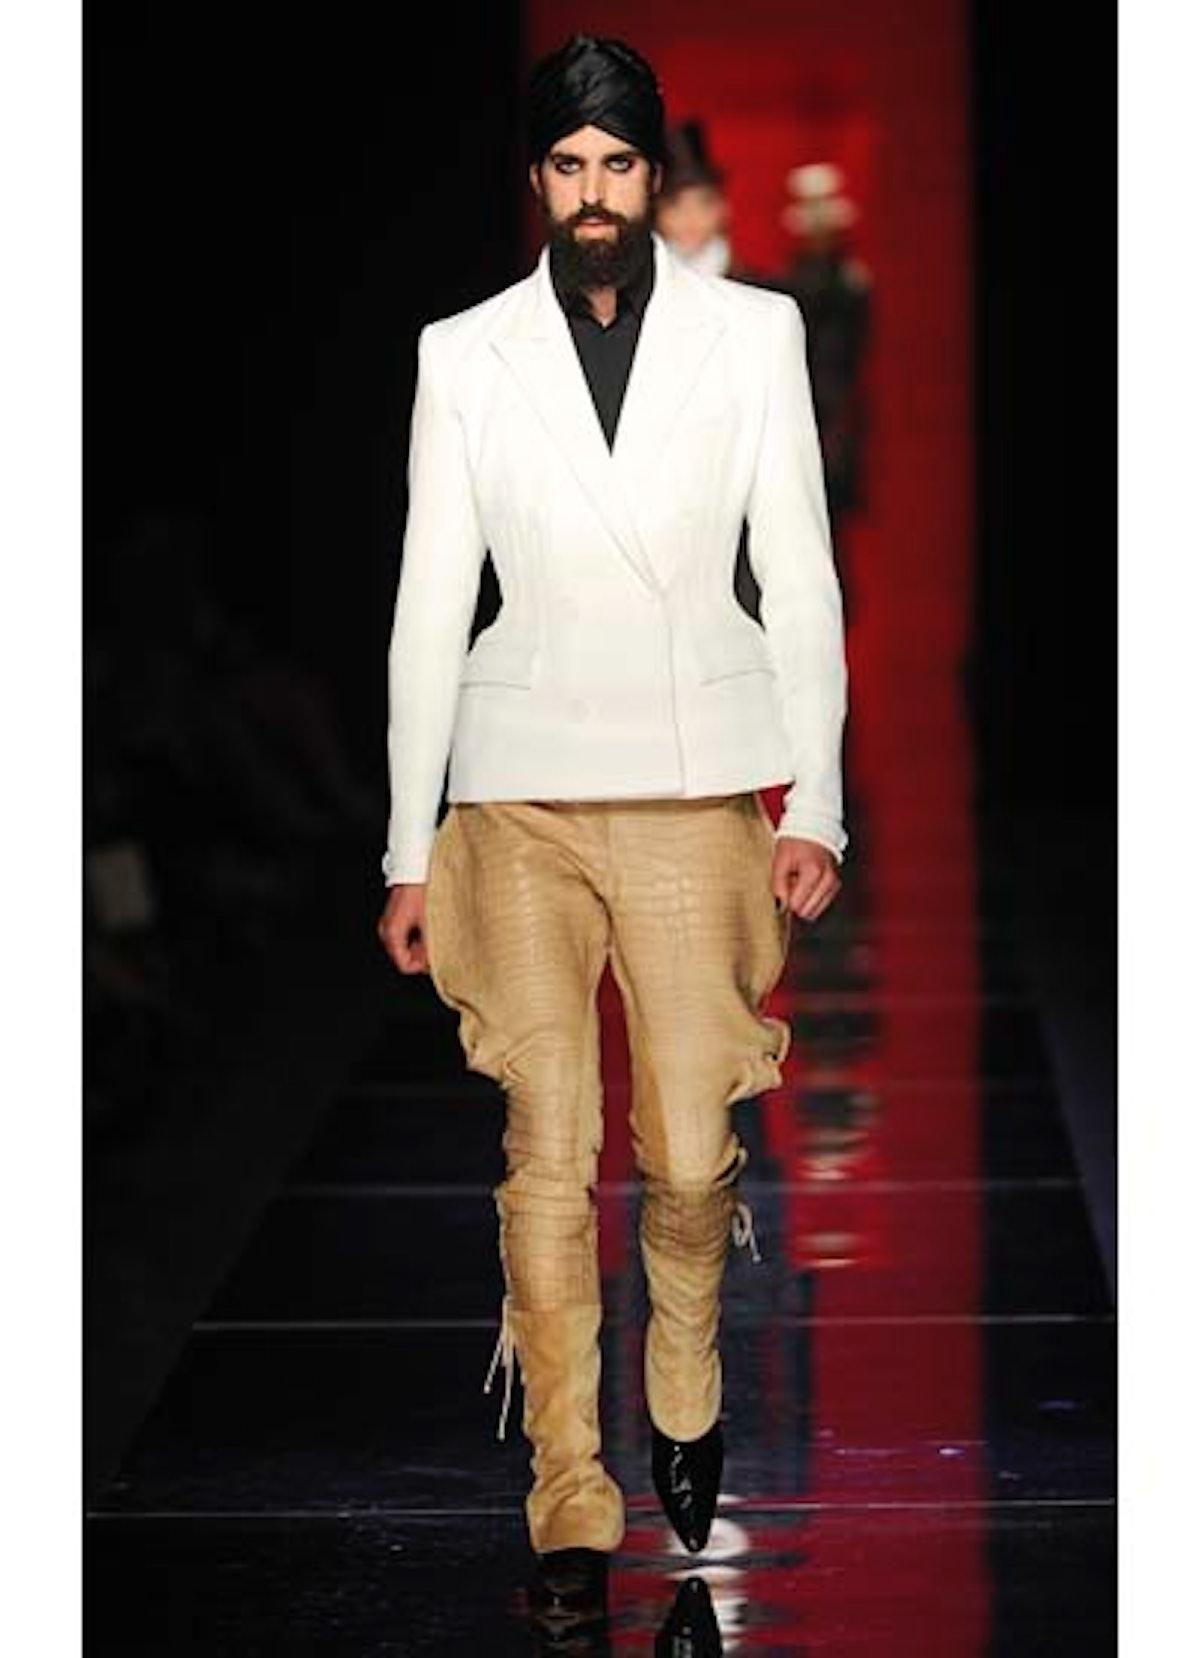 fass-jean-paul-gaultier-couture-2012-runway-21-v.jpg